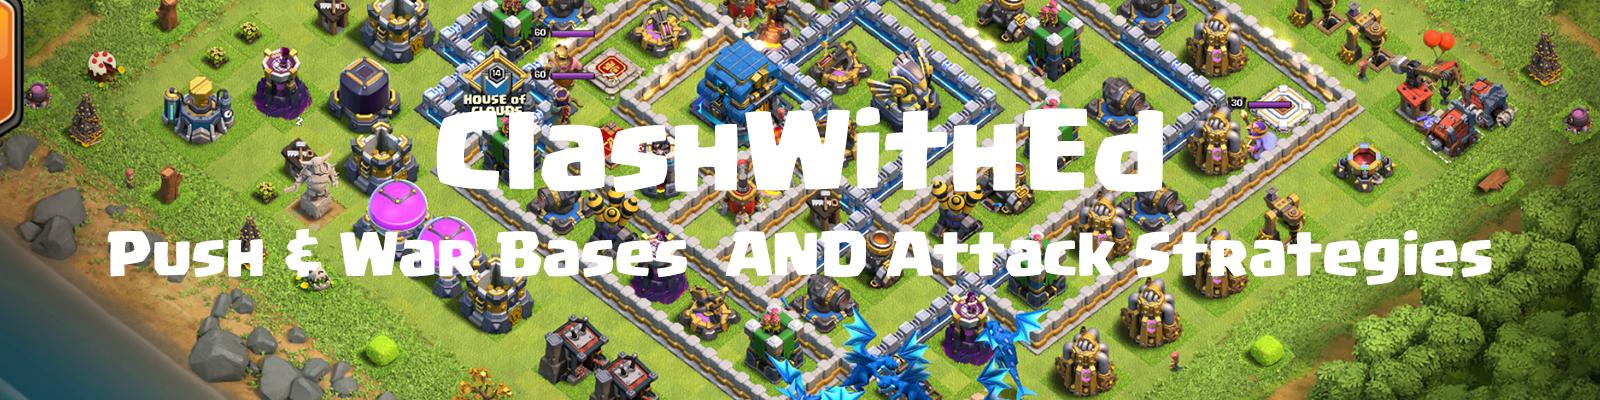 ClashWithEd is creating Amazing Push & War Base layouts +